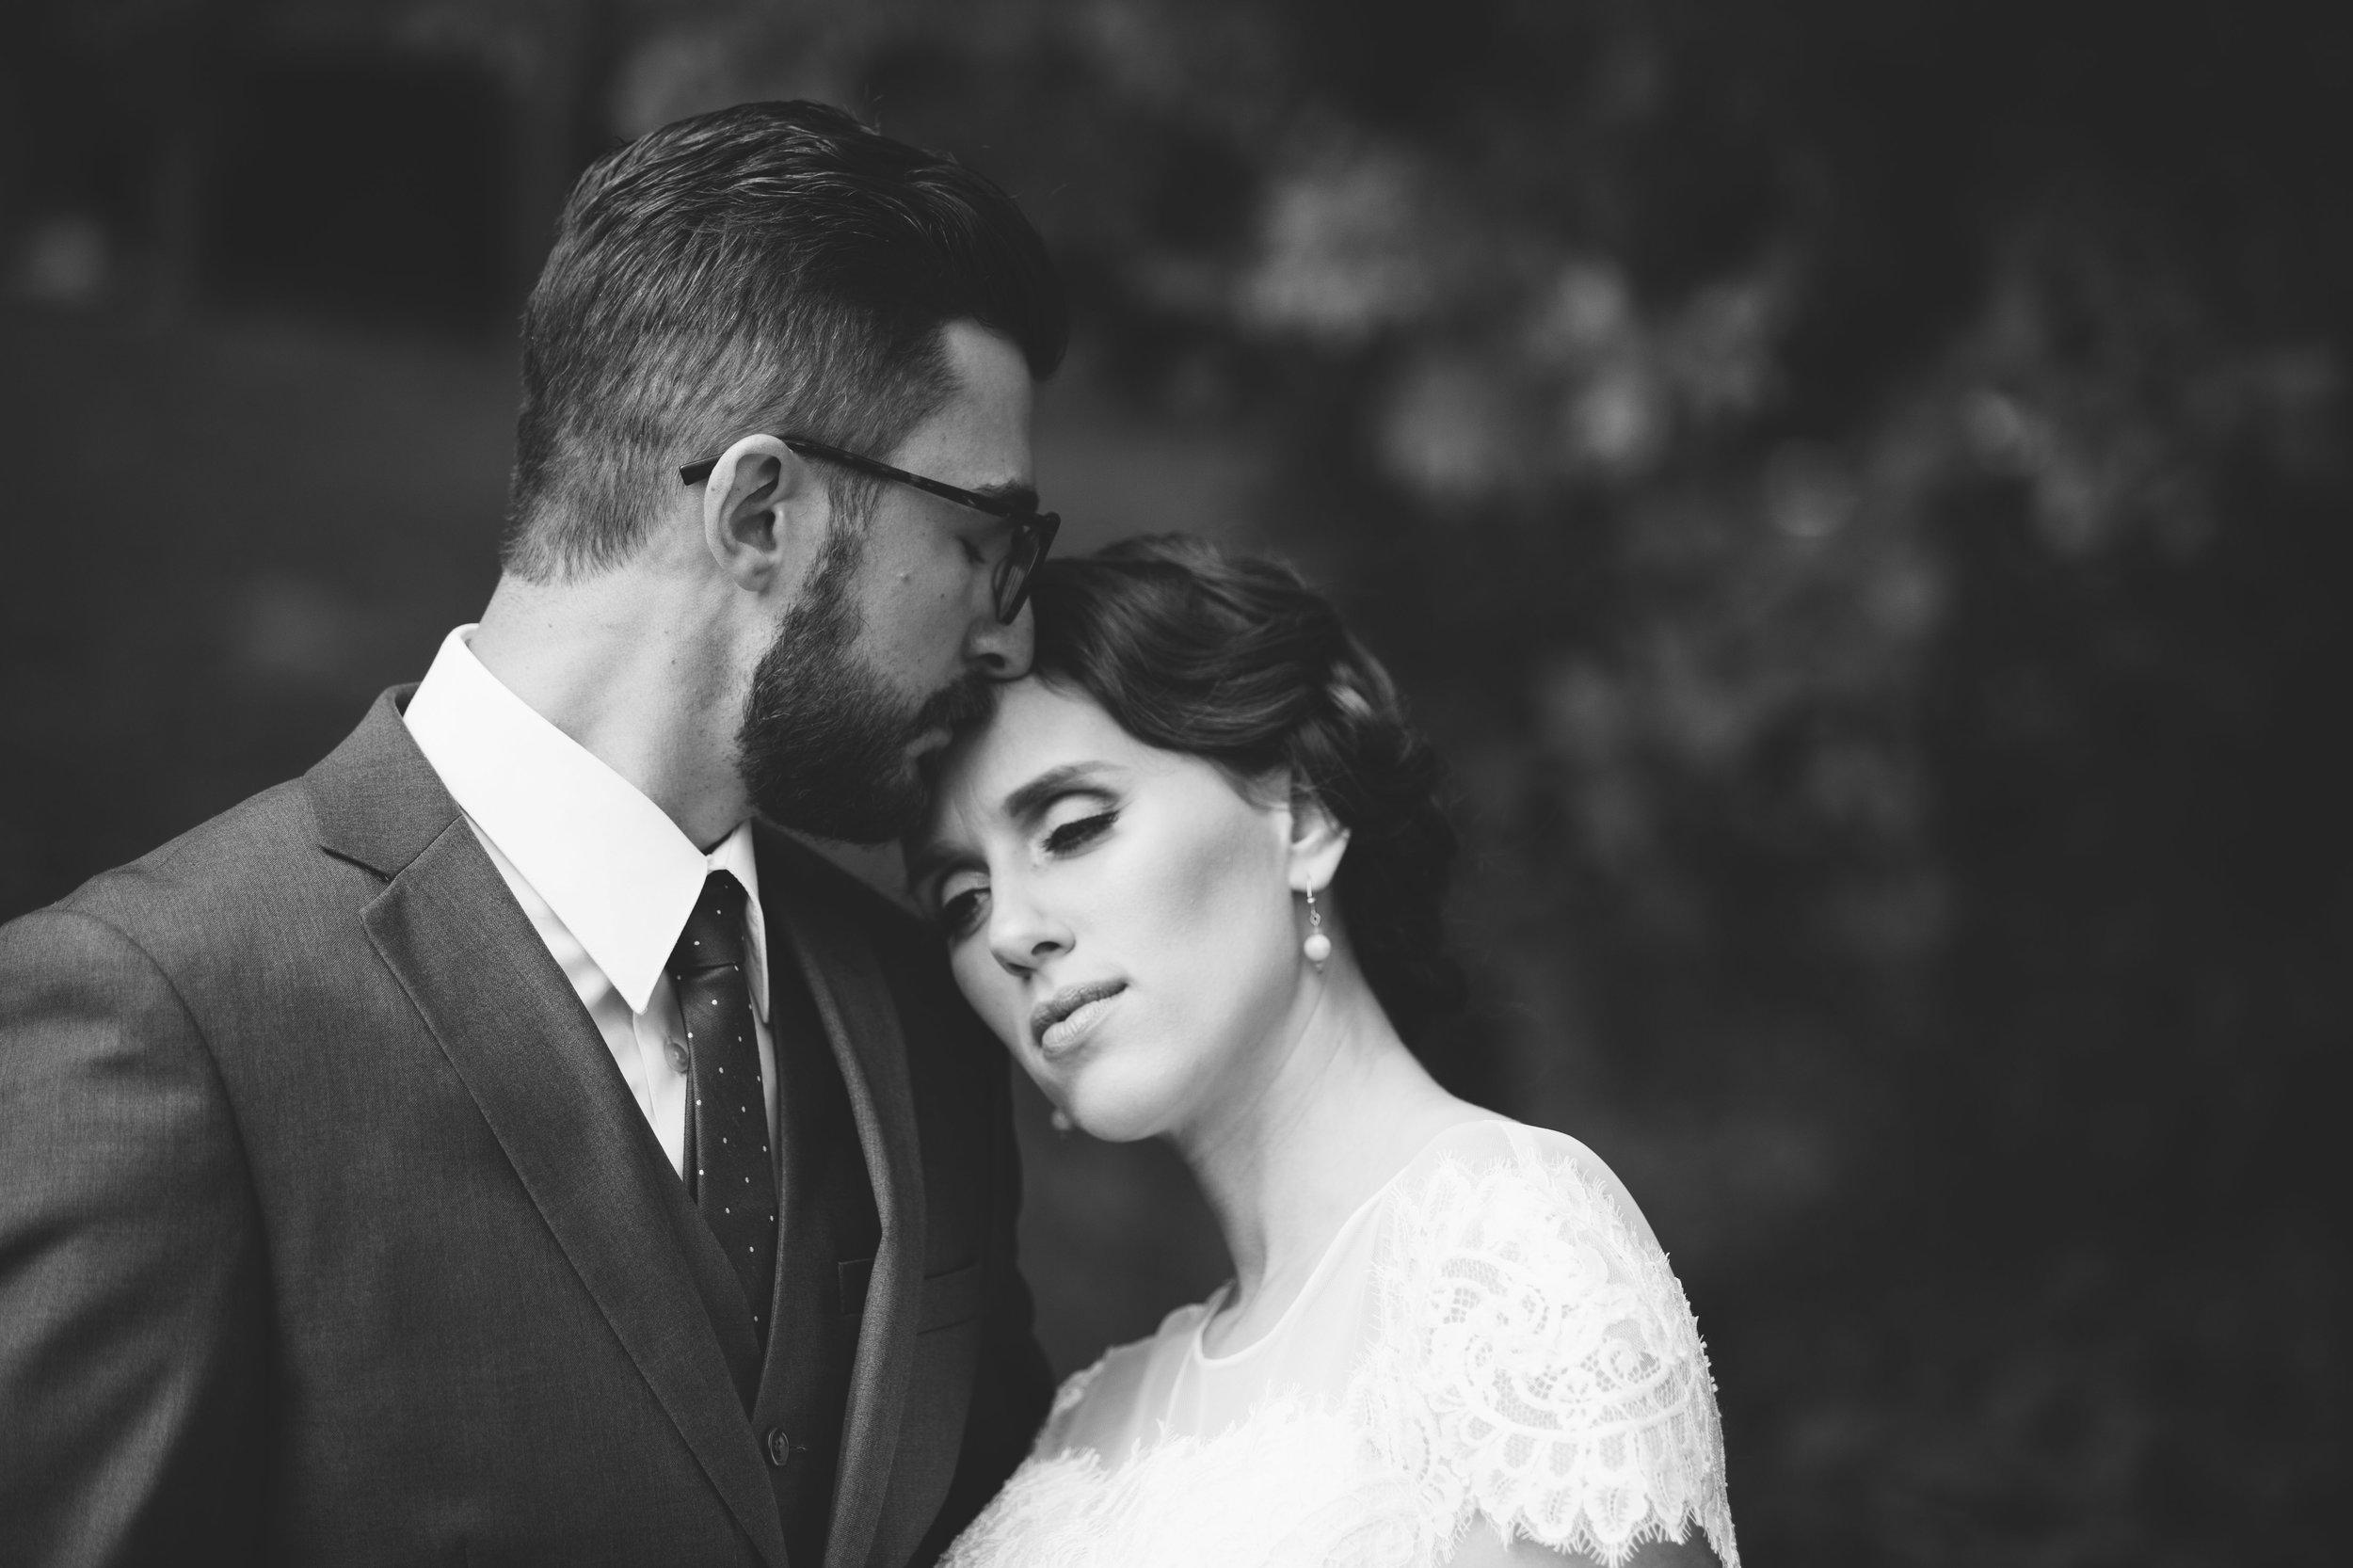 grand_rapids_wedding_rockford_wedding_richard_app_gallery_wedding_grand_rapids_wedding_photographer_summer_wedding_wabasis_lake_park_wedding_rustic_wedding-14.jpg